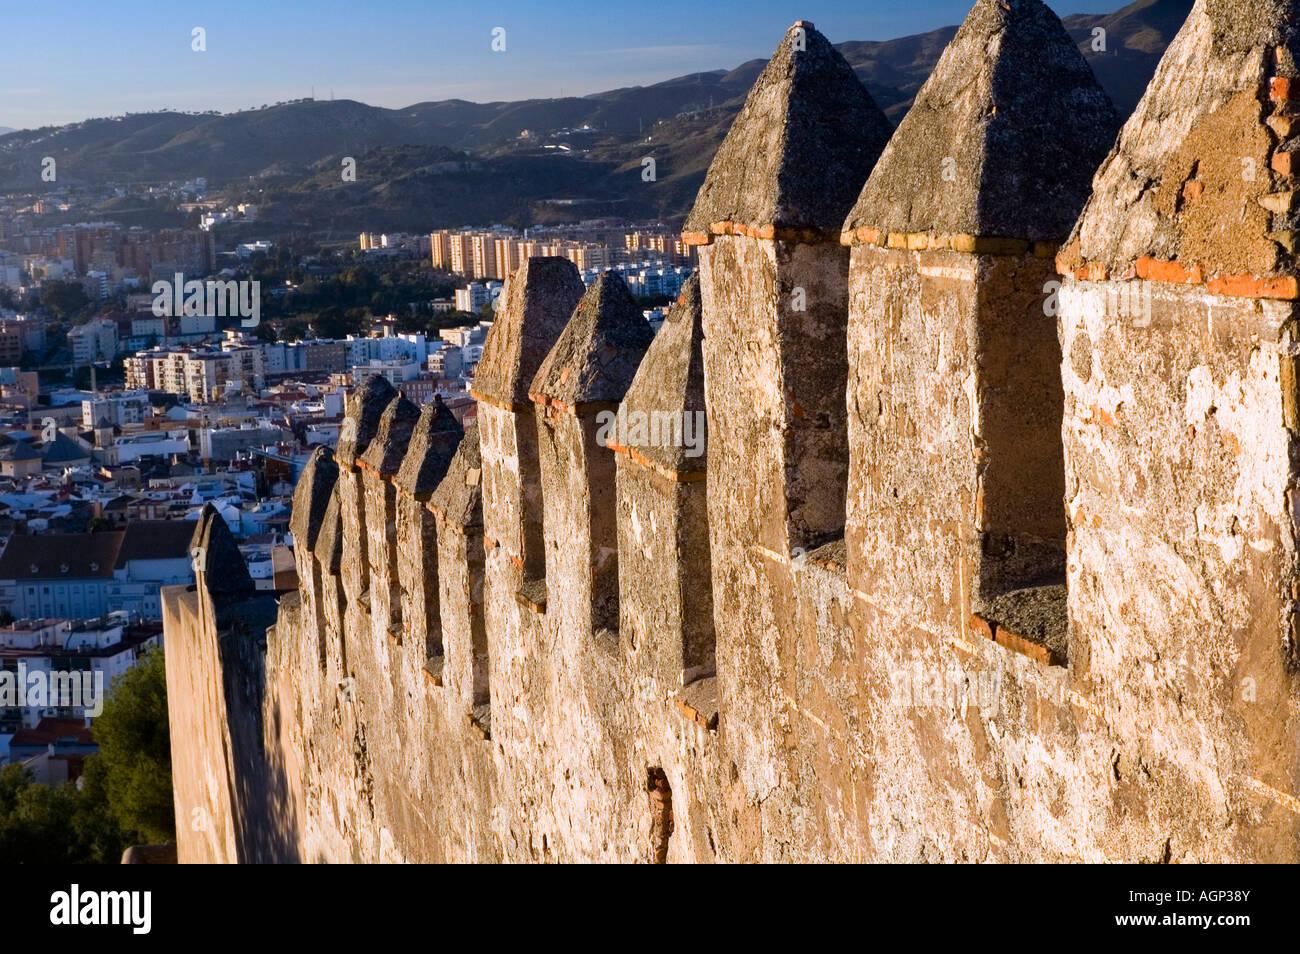 Alcazaba; mussulman monumento a Malaga (Spagna). Immagini Stock